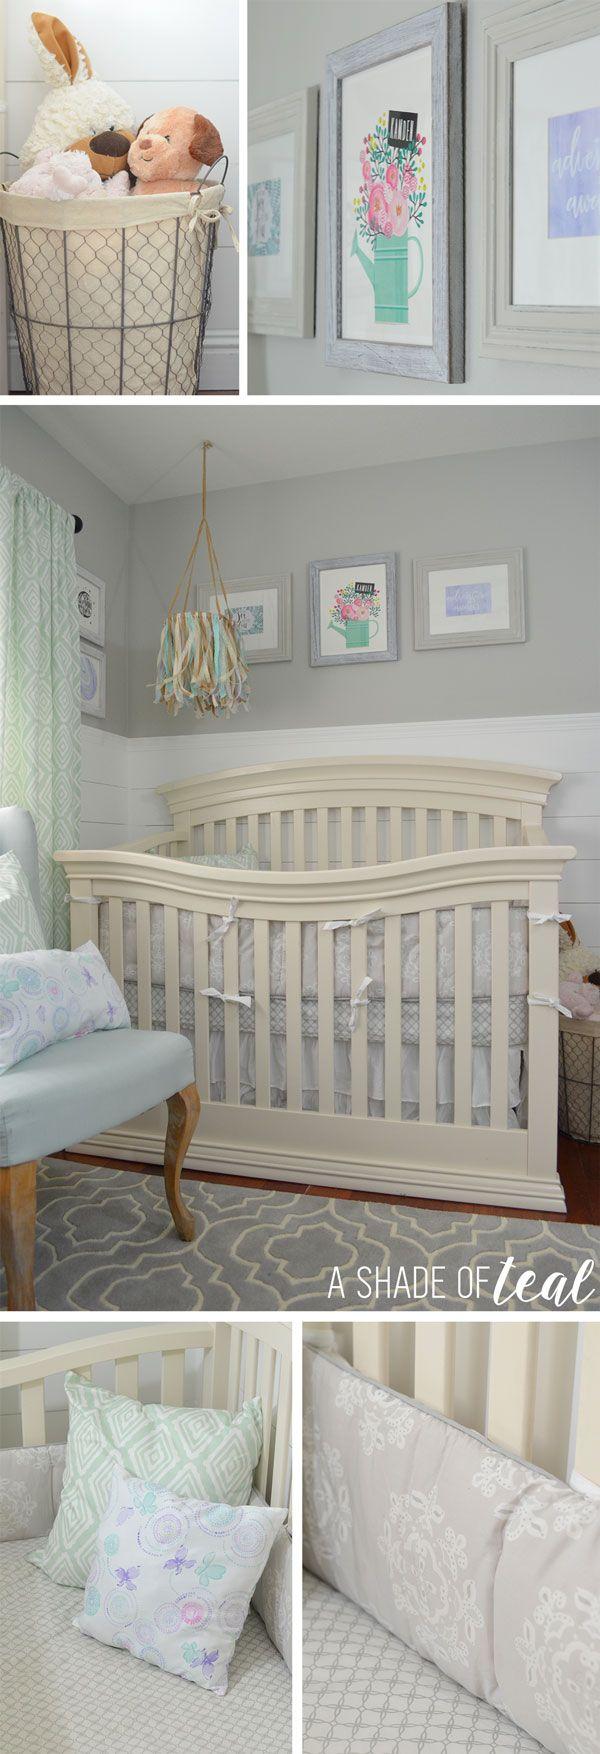 Owl crafts baby bedding nursery decor nursery crafts forward pink owl - Rustic Glam Nursery One Room Challenge The Reveal